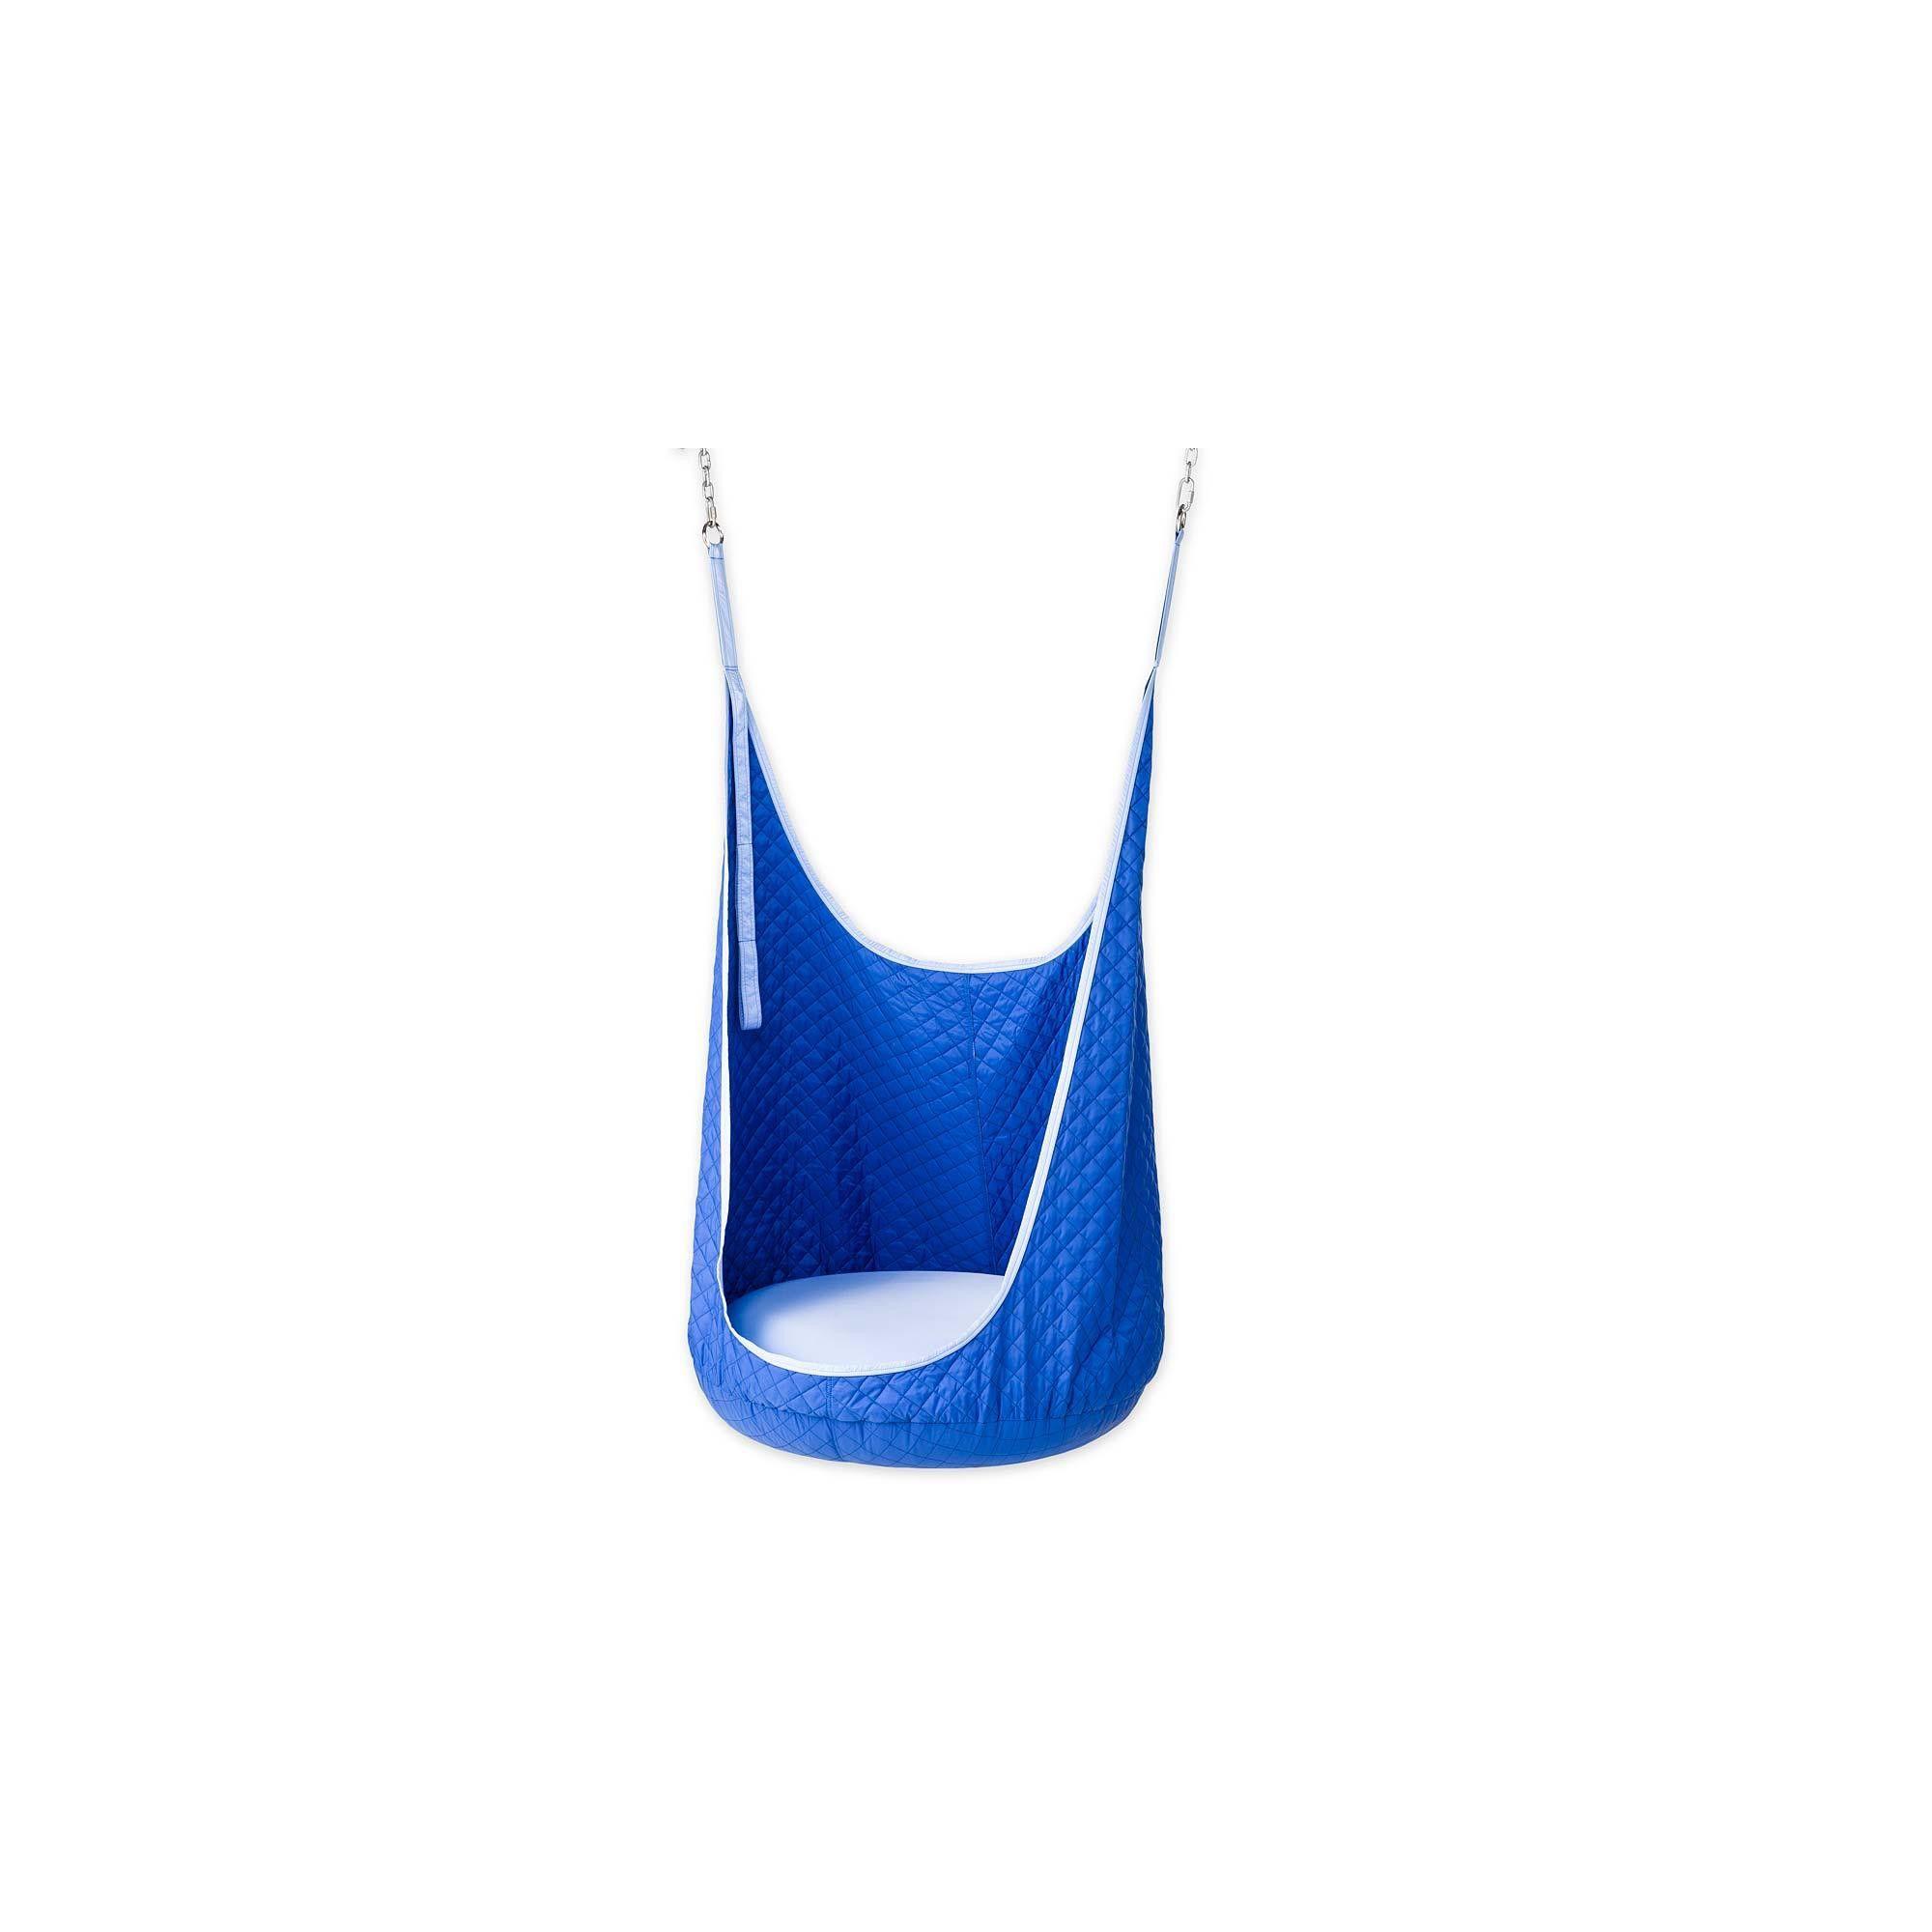 Cozy Hugglepod Hanging Hammock Lounge Chair Use Indoors Or